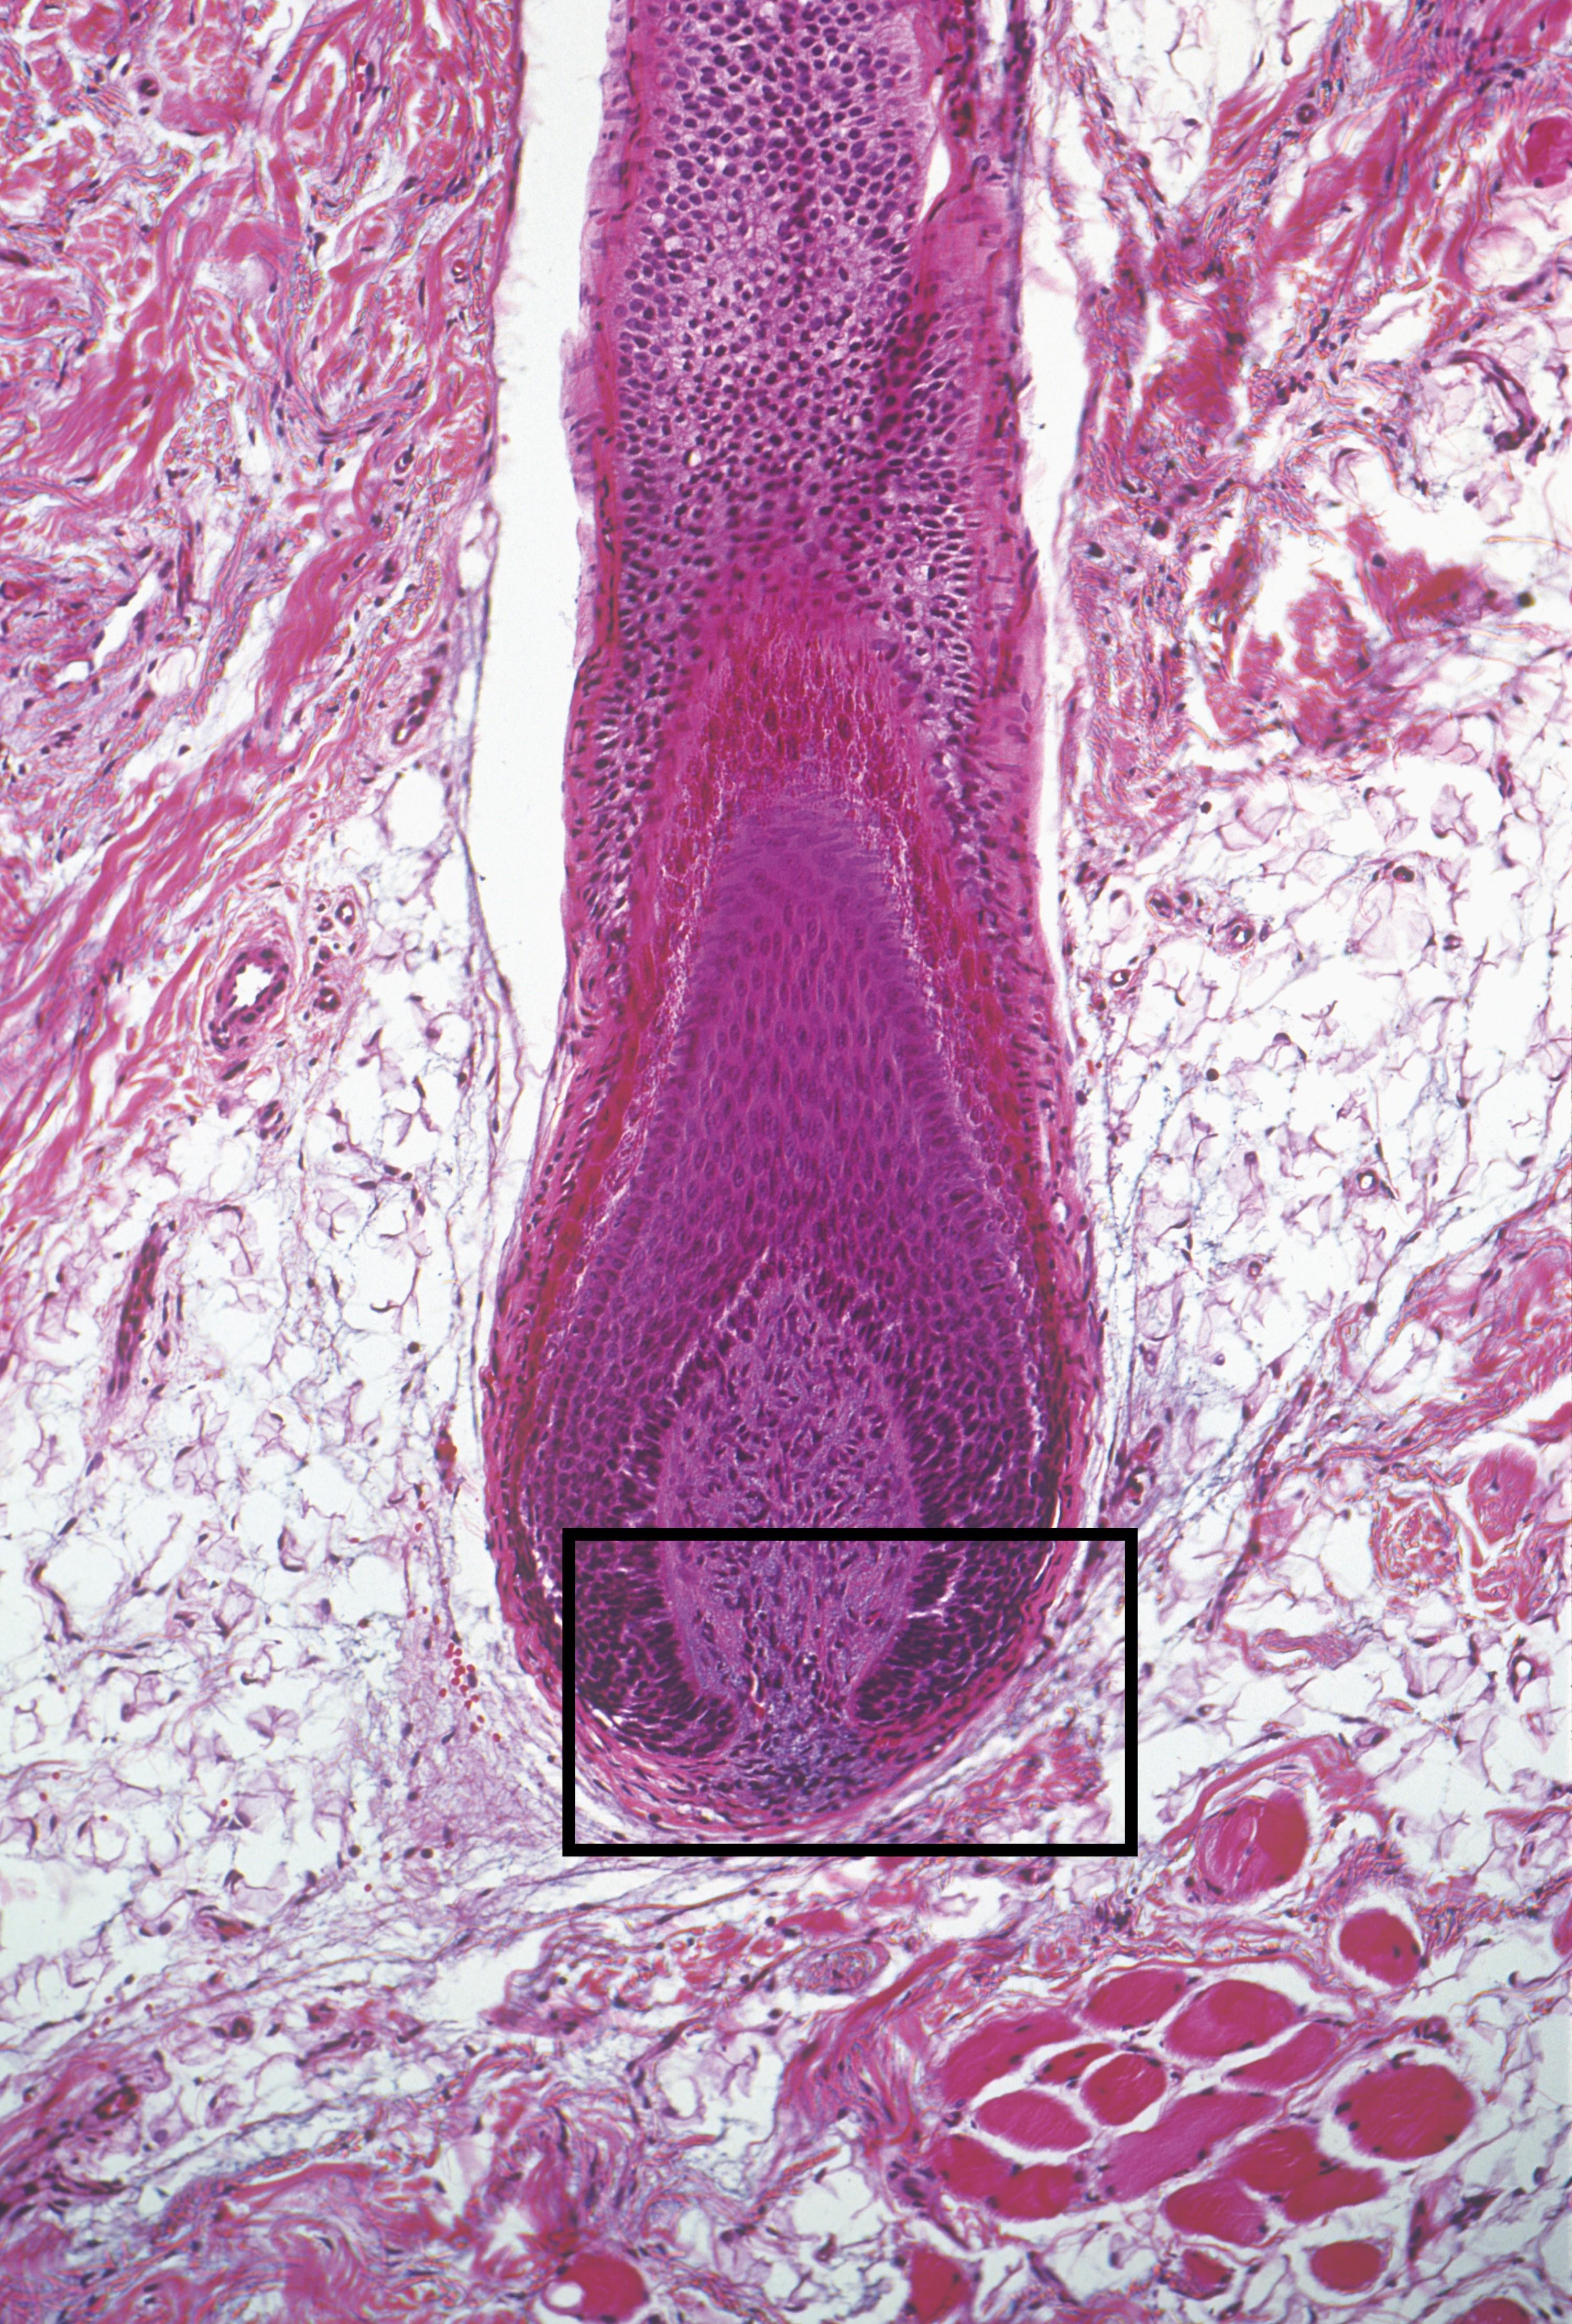 Base d'un cheveu observée au microscope (grossissement : X52).